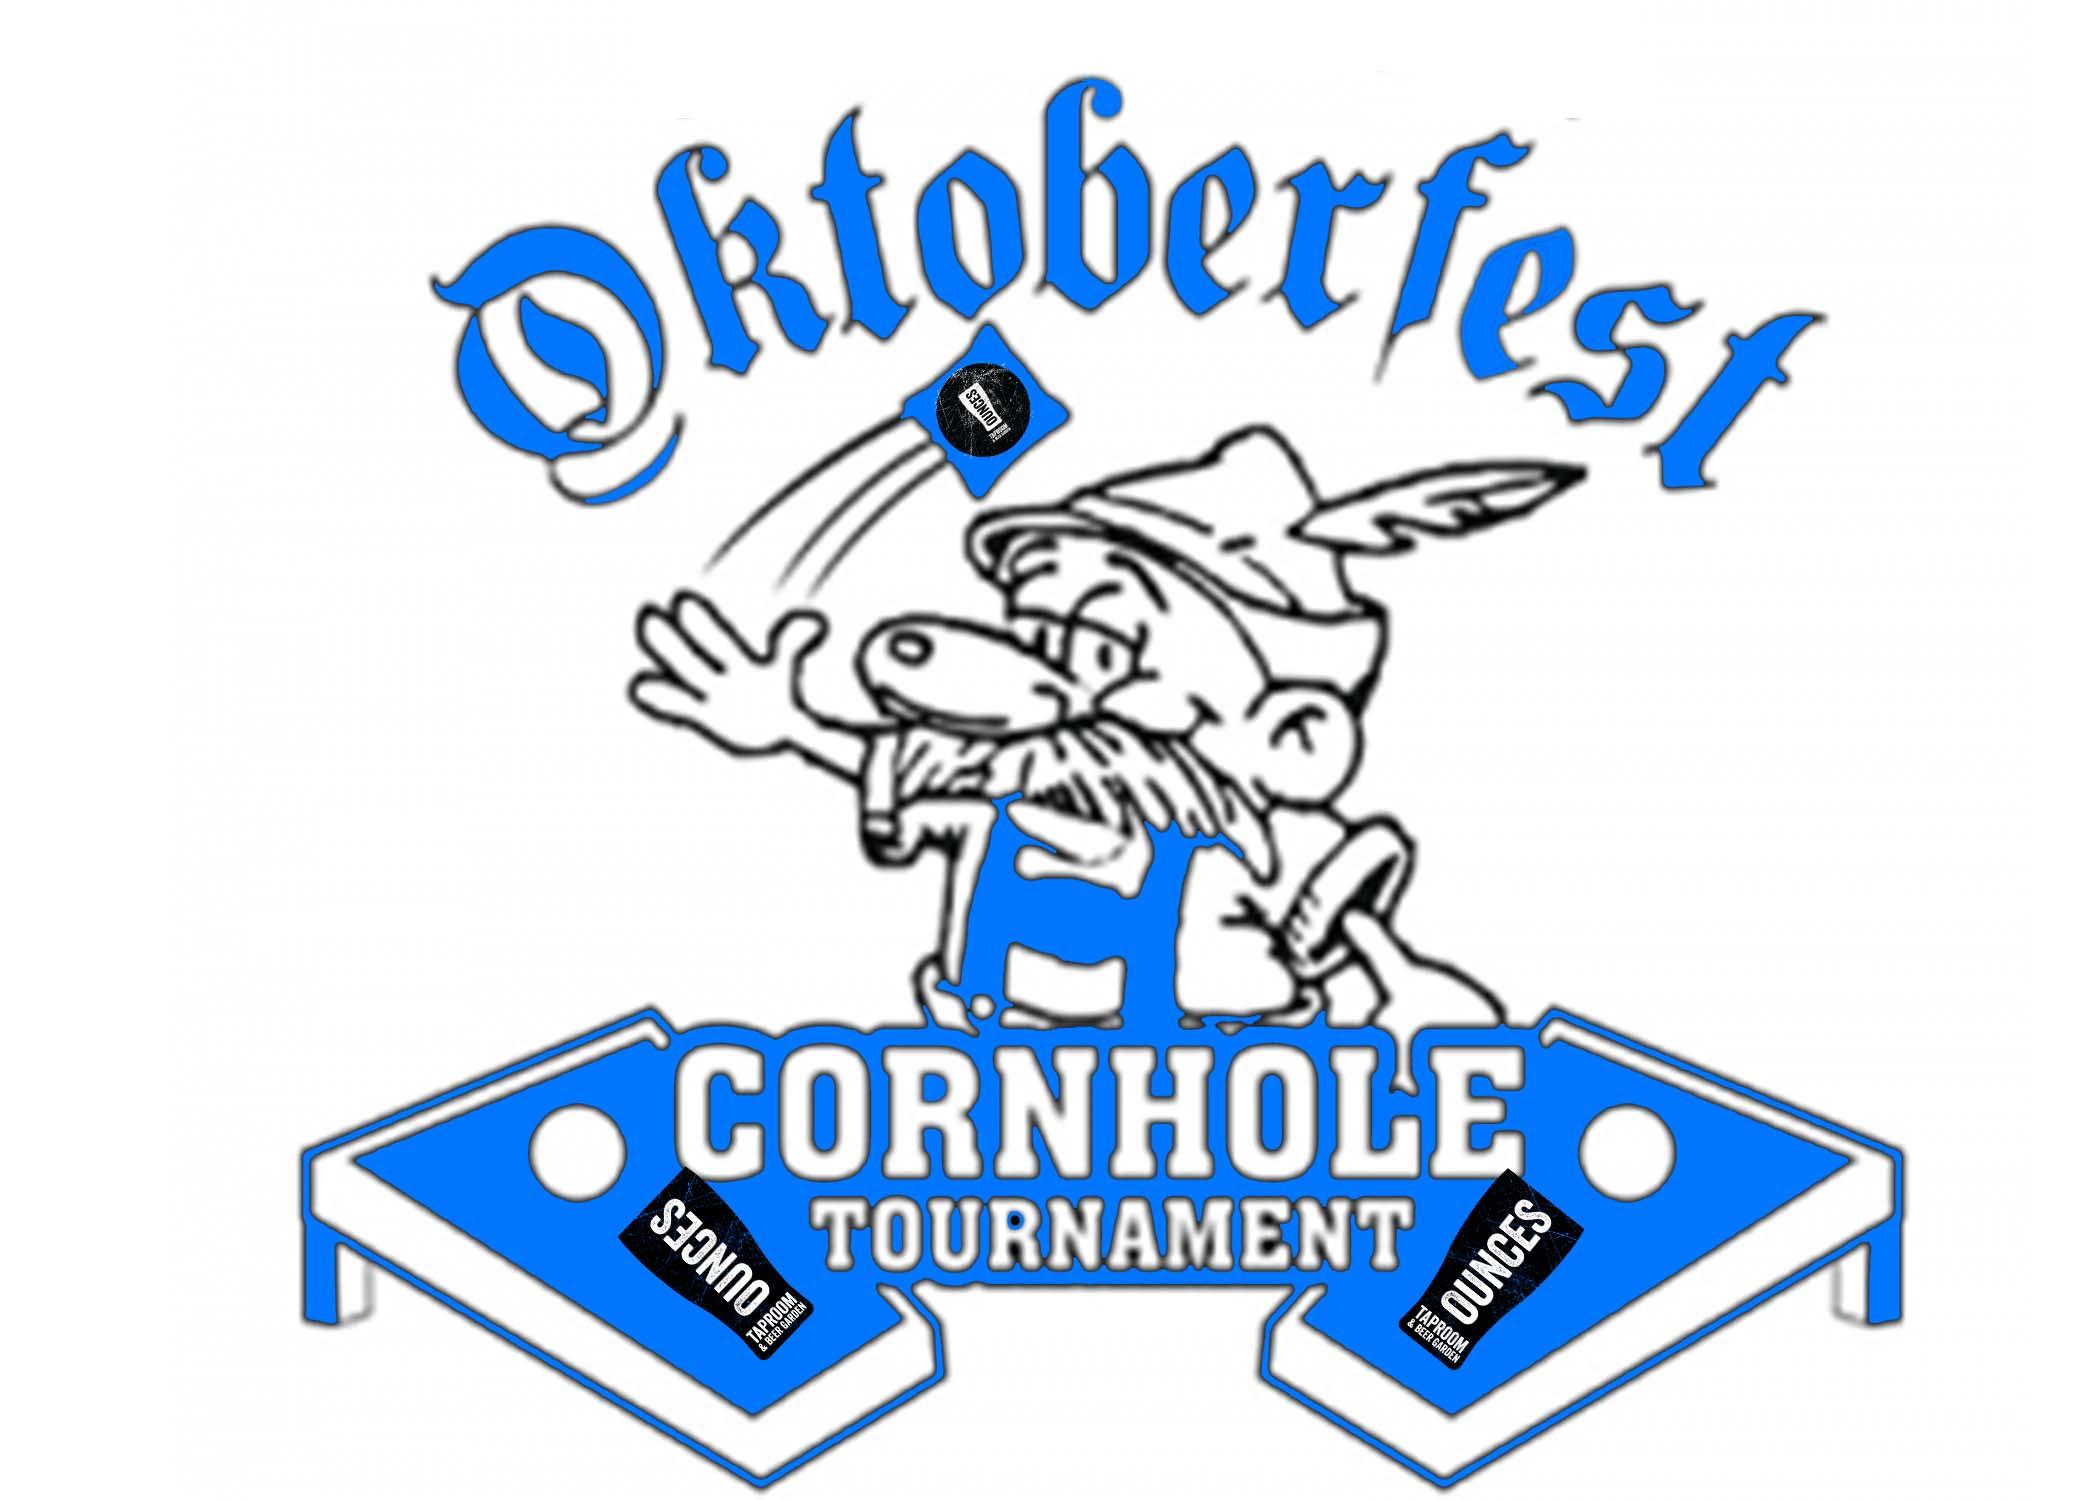 CORNHOLE-tourney-oktoberfest_no logo.jpg